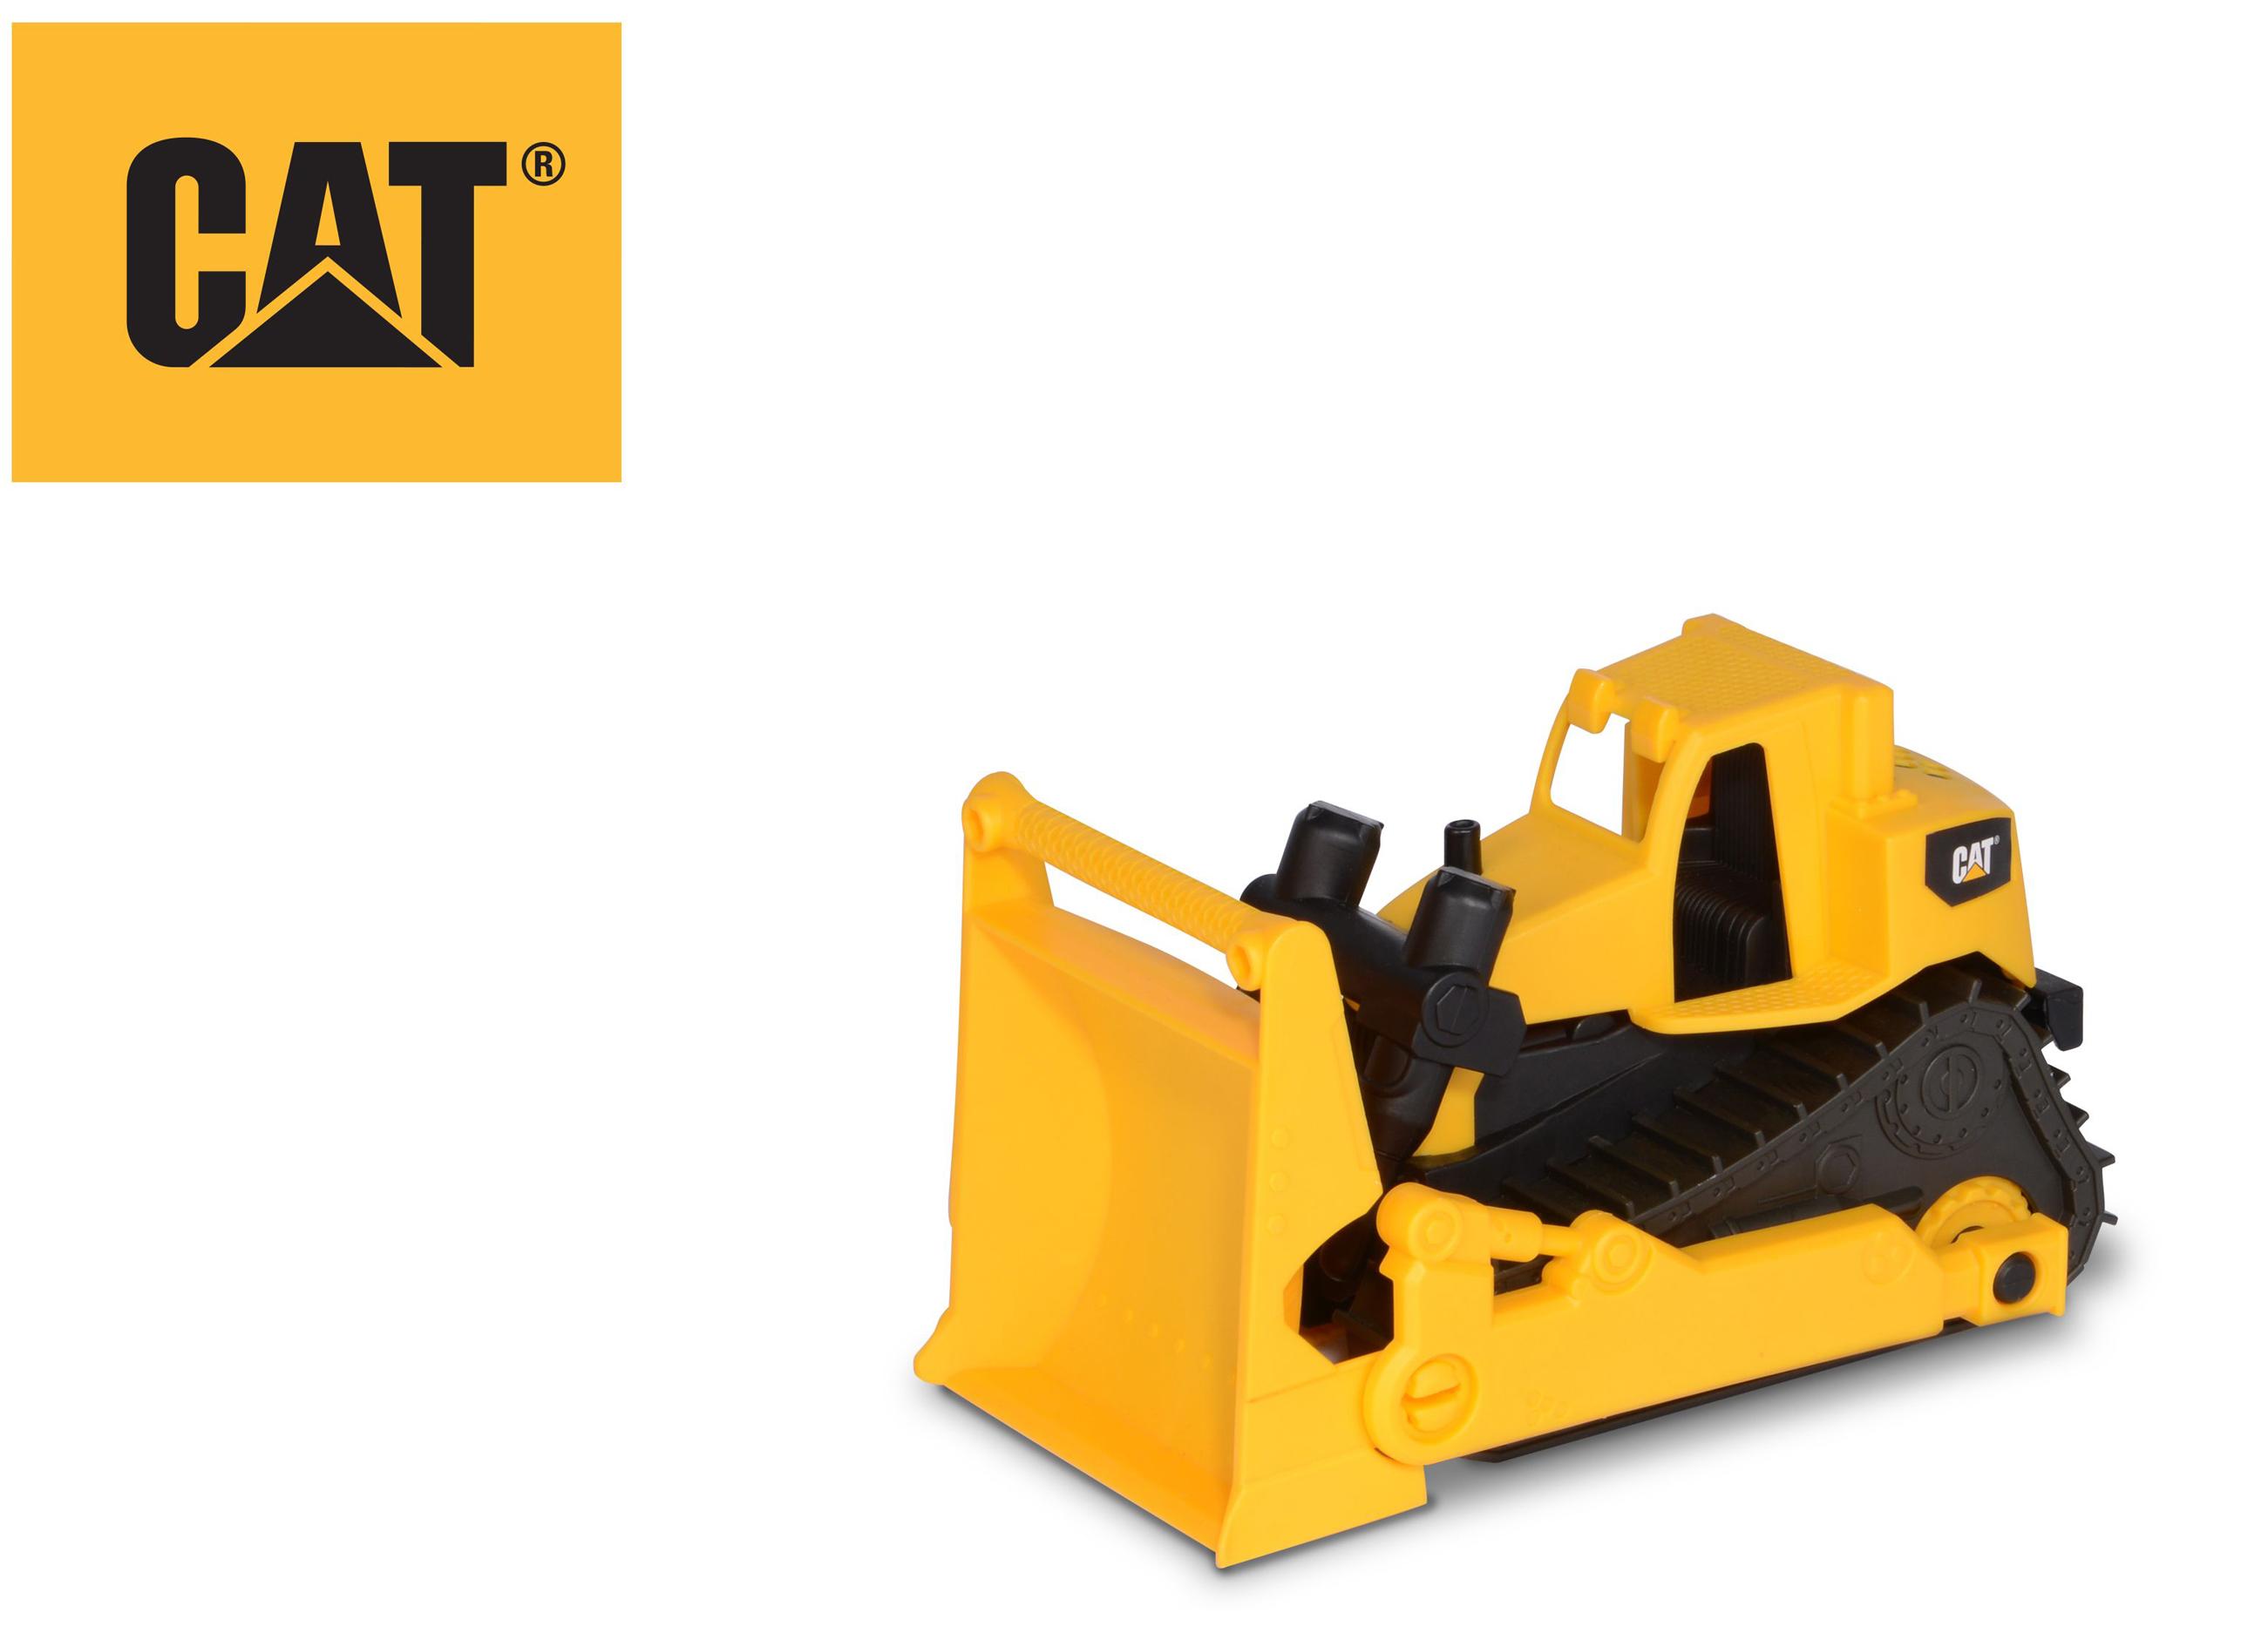 CAT telaketju puskutraktori 18 cm